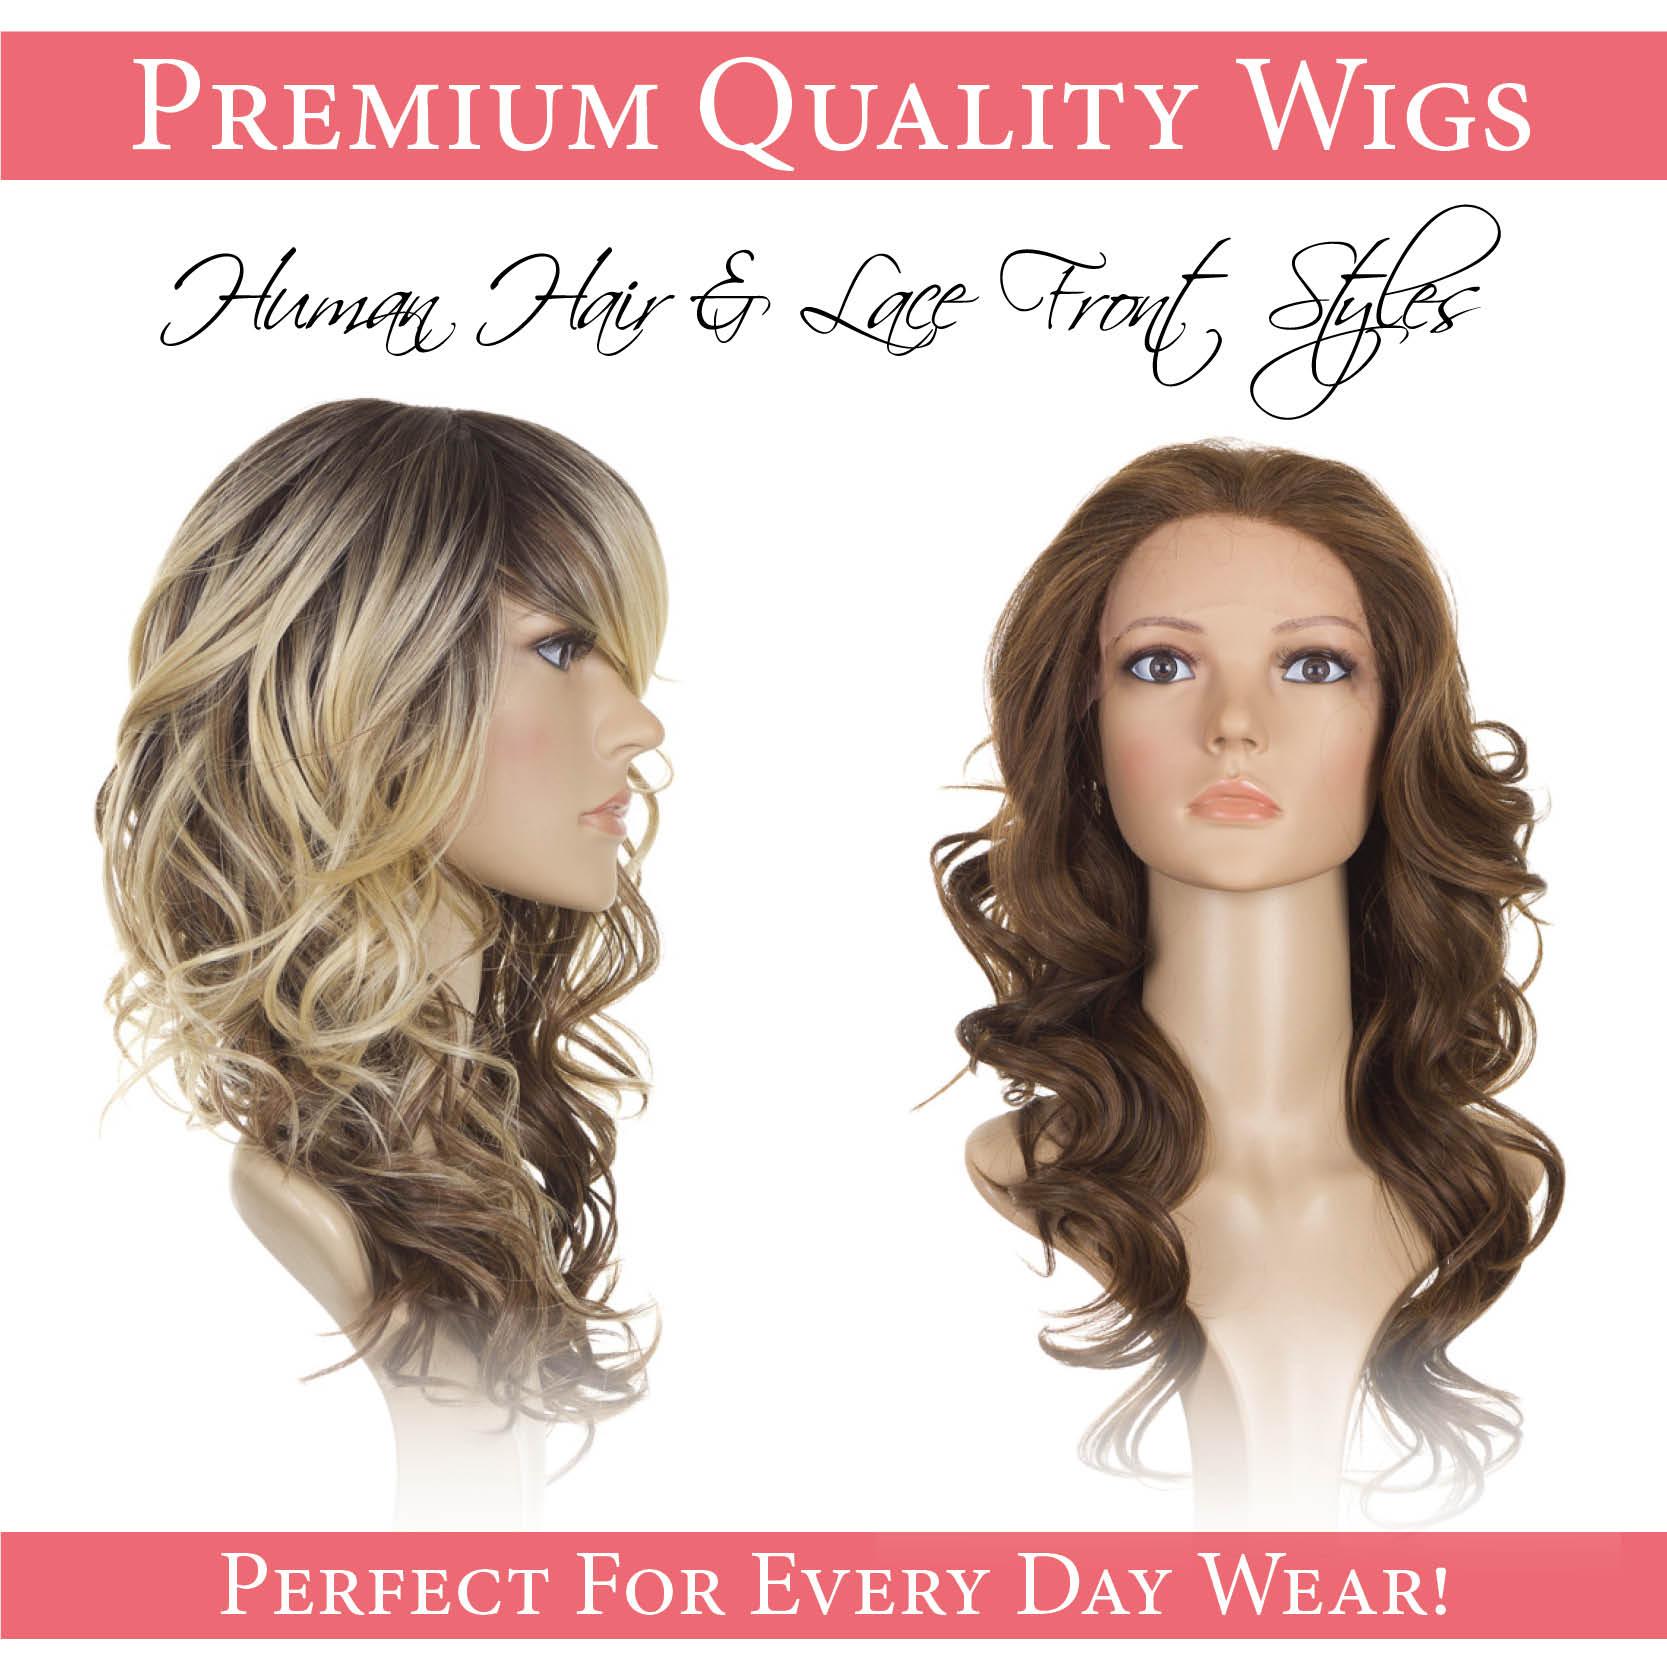 new-premium-qual-banner.jpg